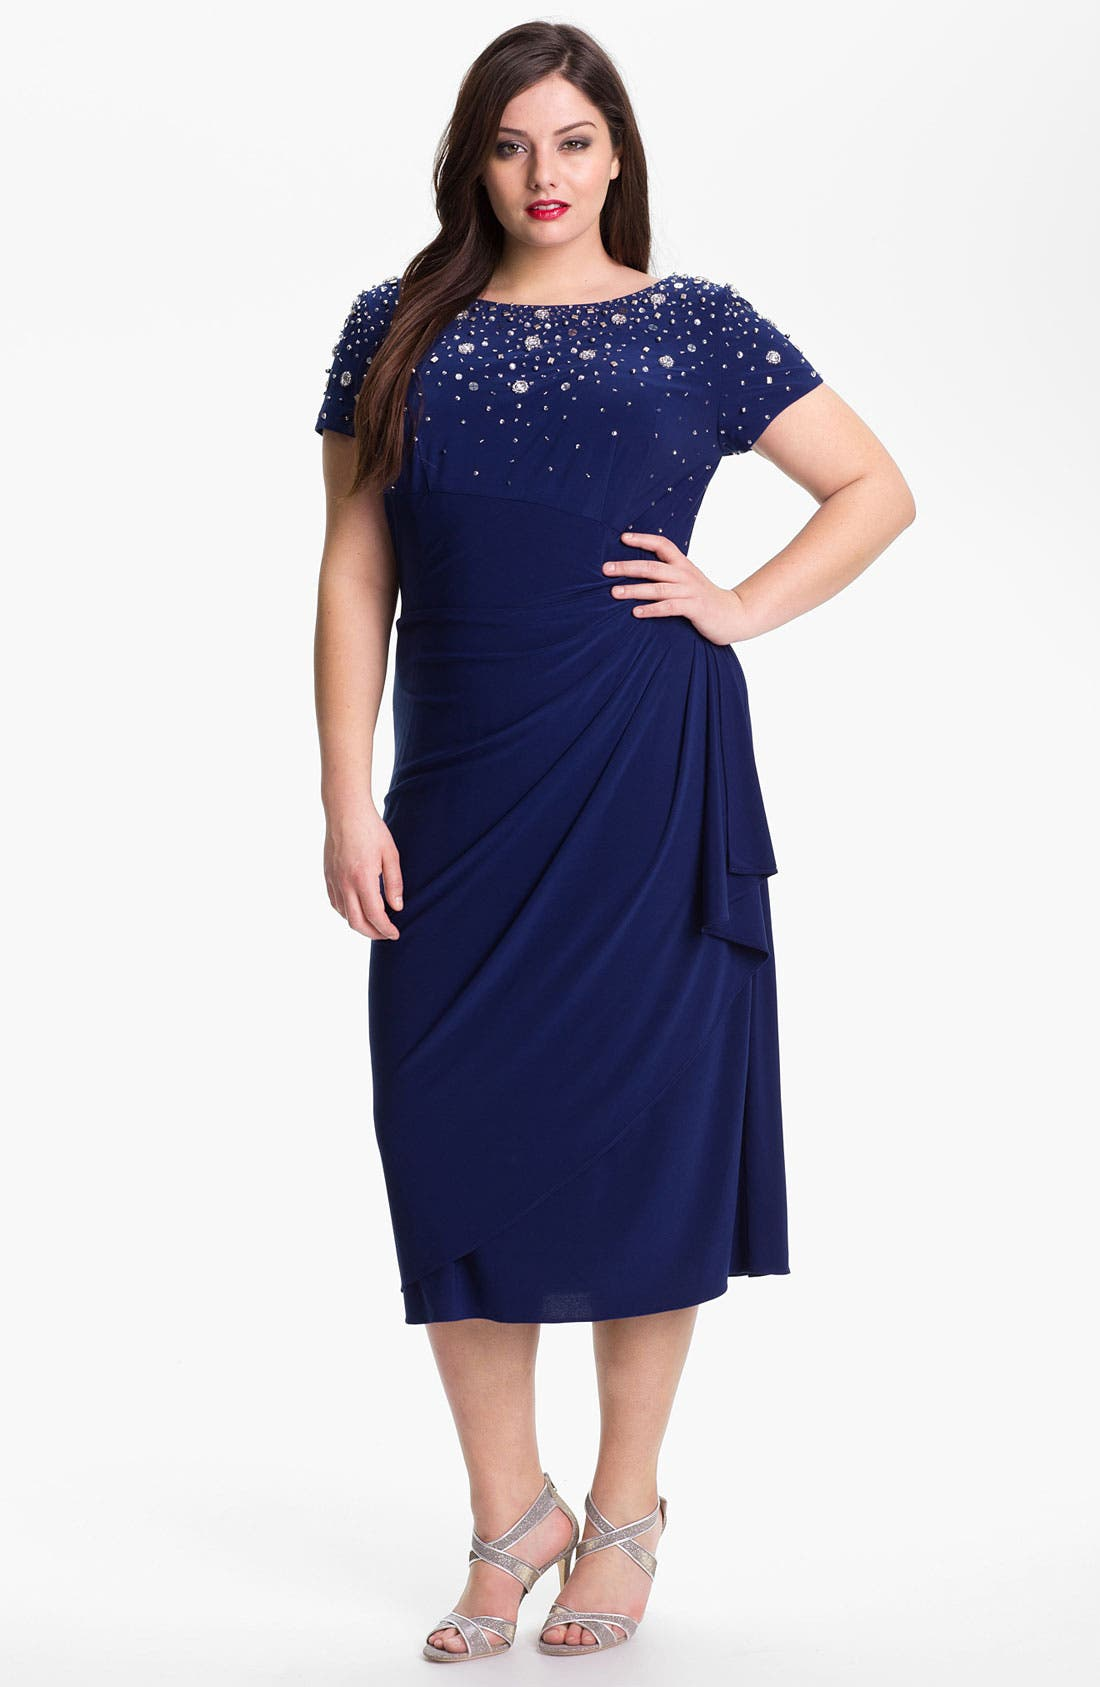 Alternate Image 1 Selected - Alex Evenings Embellished Faux Wrap Jersey Dress